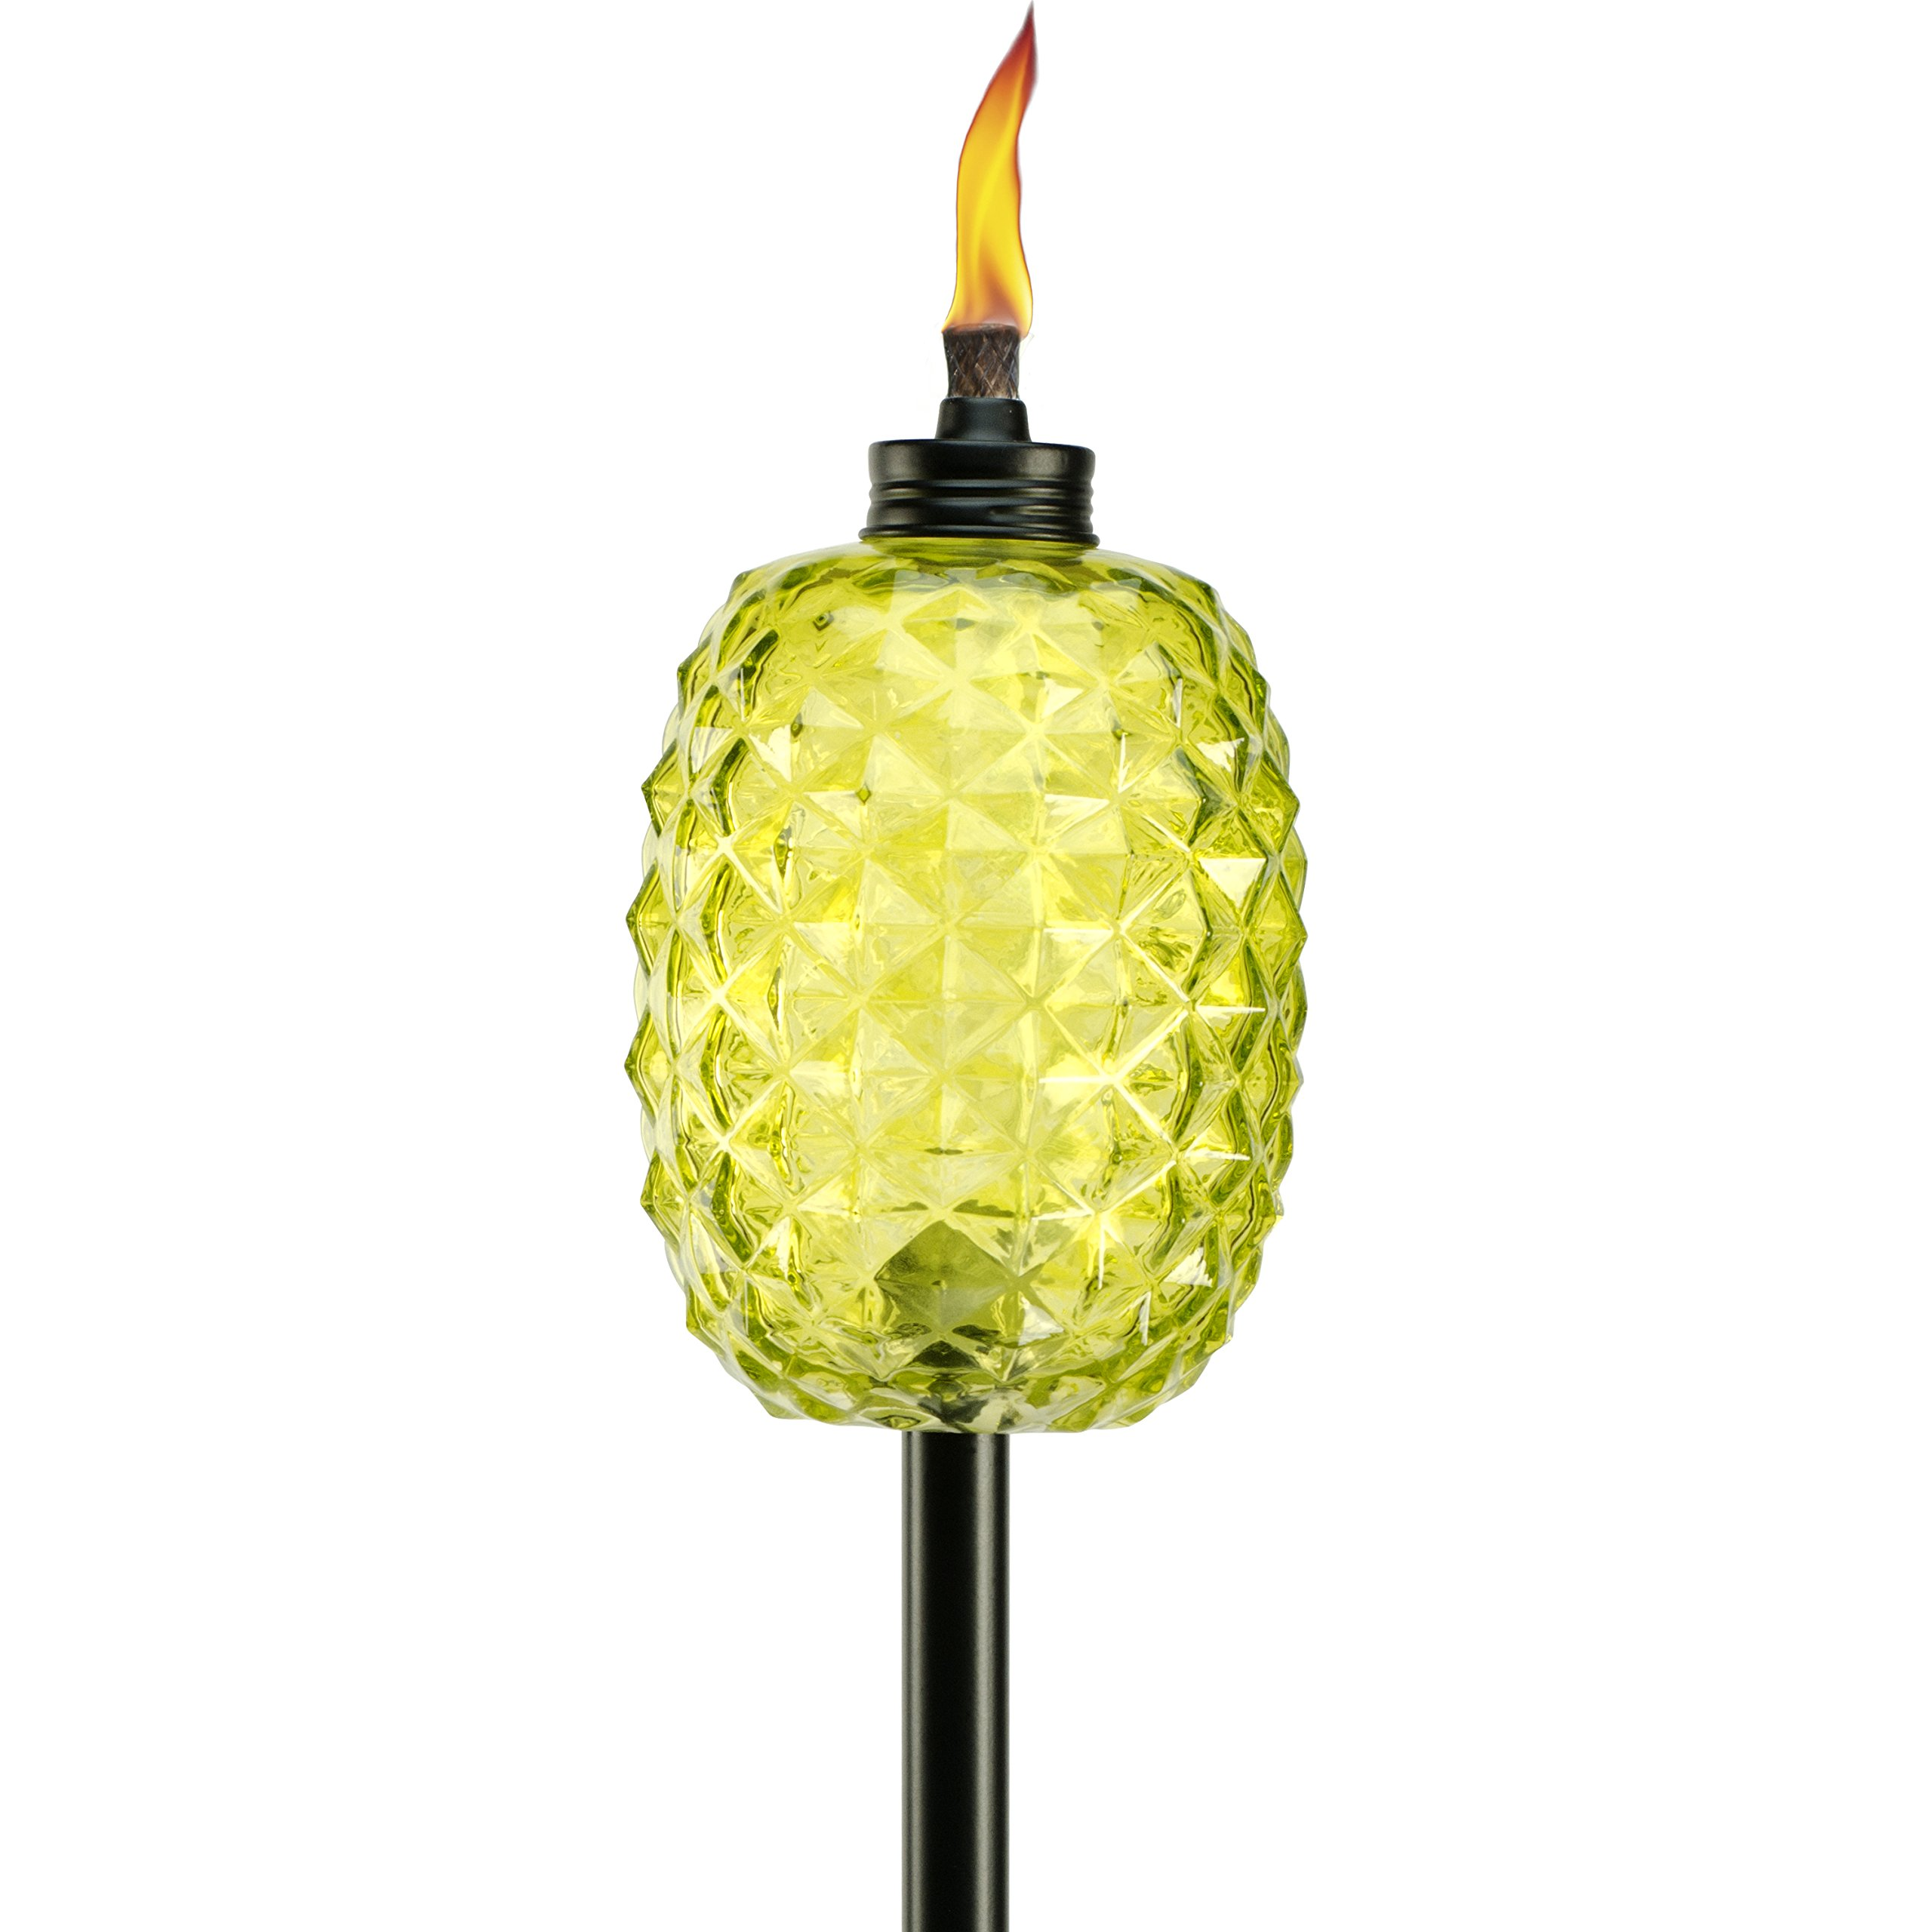 TIKI Brand 65-Inch Aloha Pineapple Glass Torch, Green by Tiki